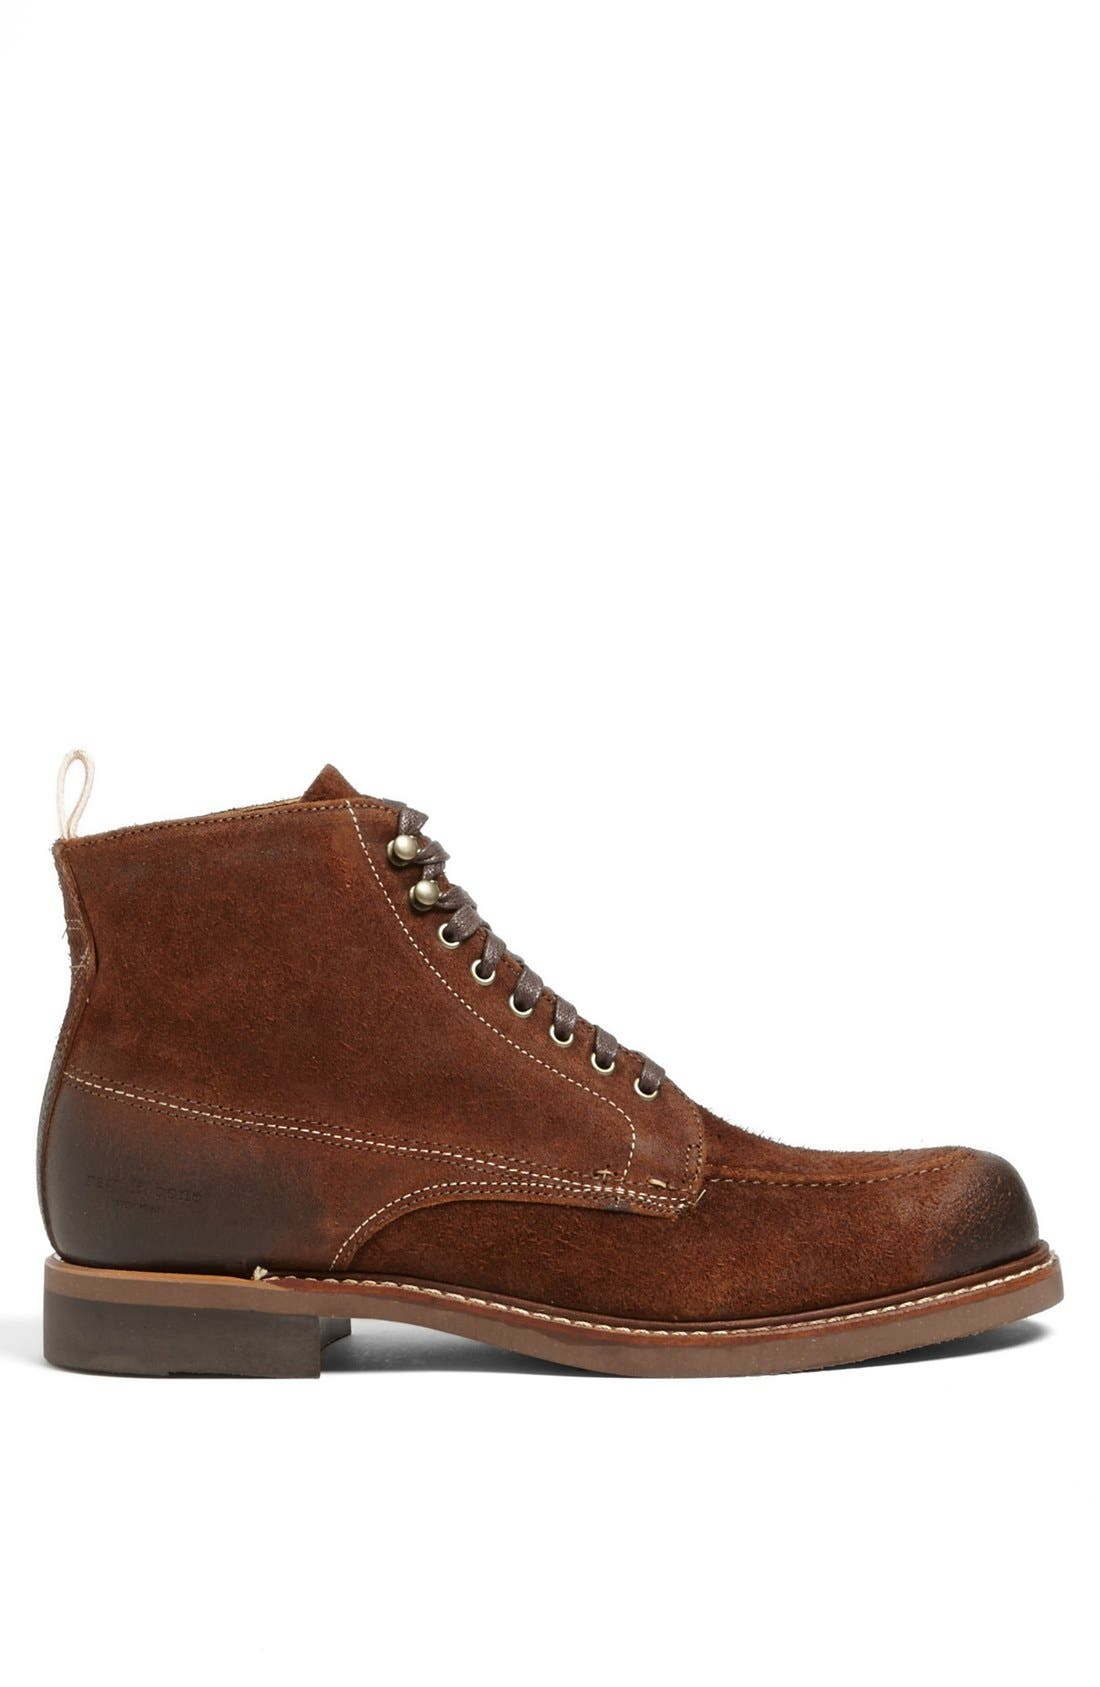 'Rowan' Moc Toe Boot,                             Alternate thumbnail 3, color,                             200